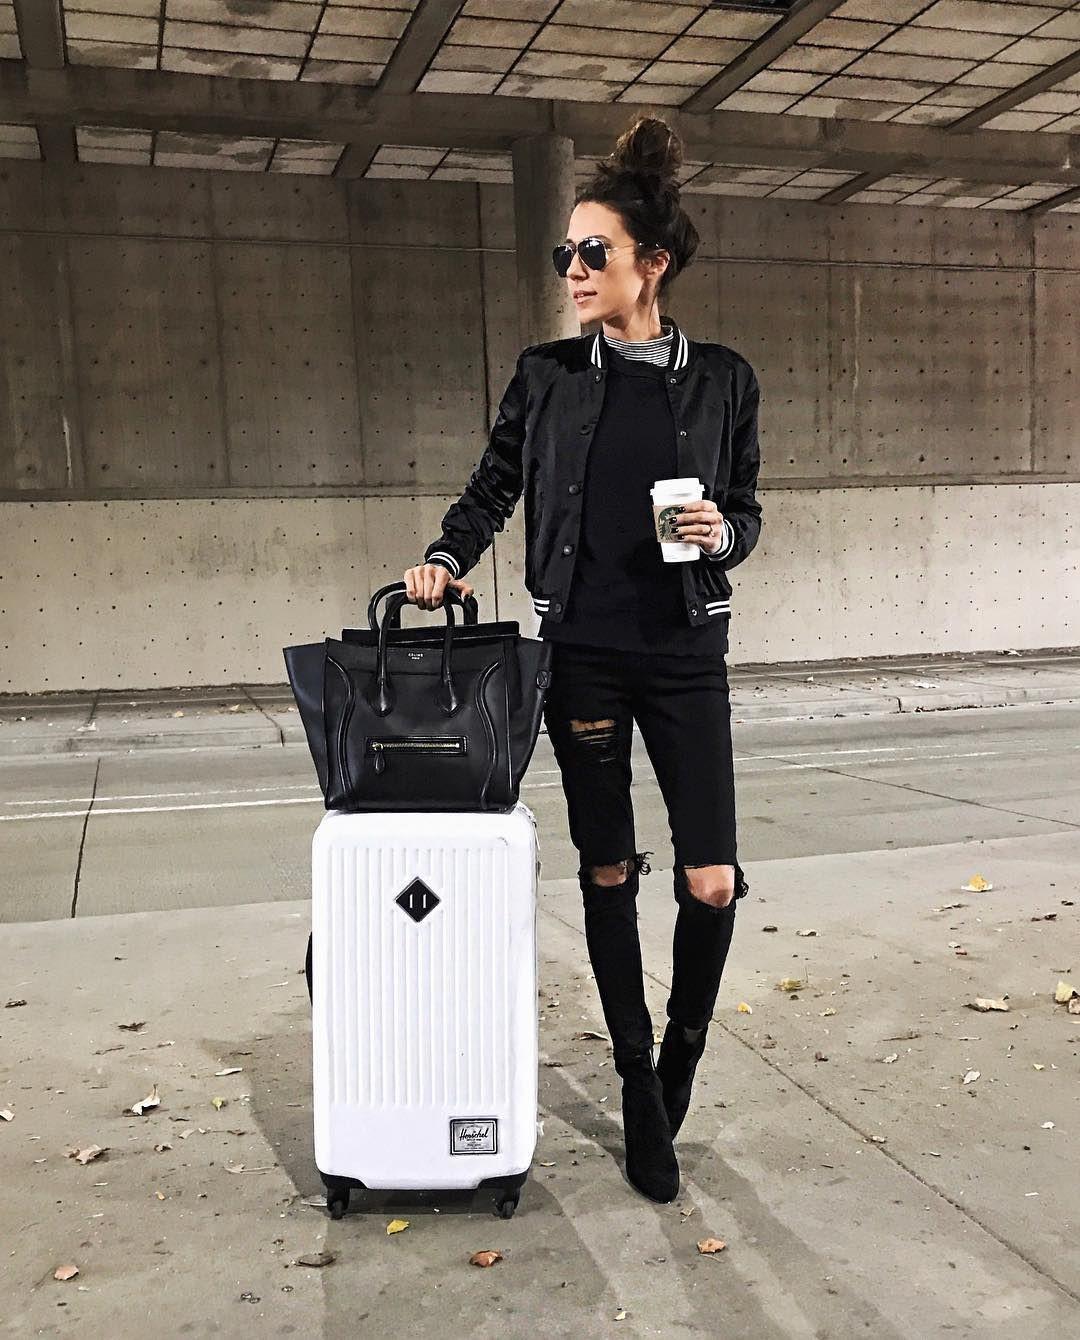 Lookbook fashion black travel outfits, street fashion, hand luggage